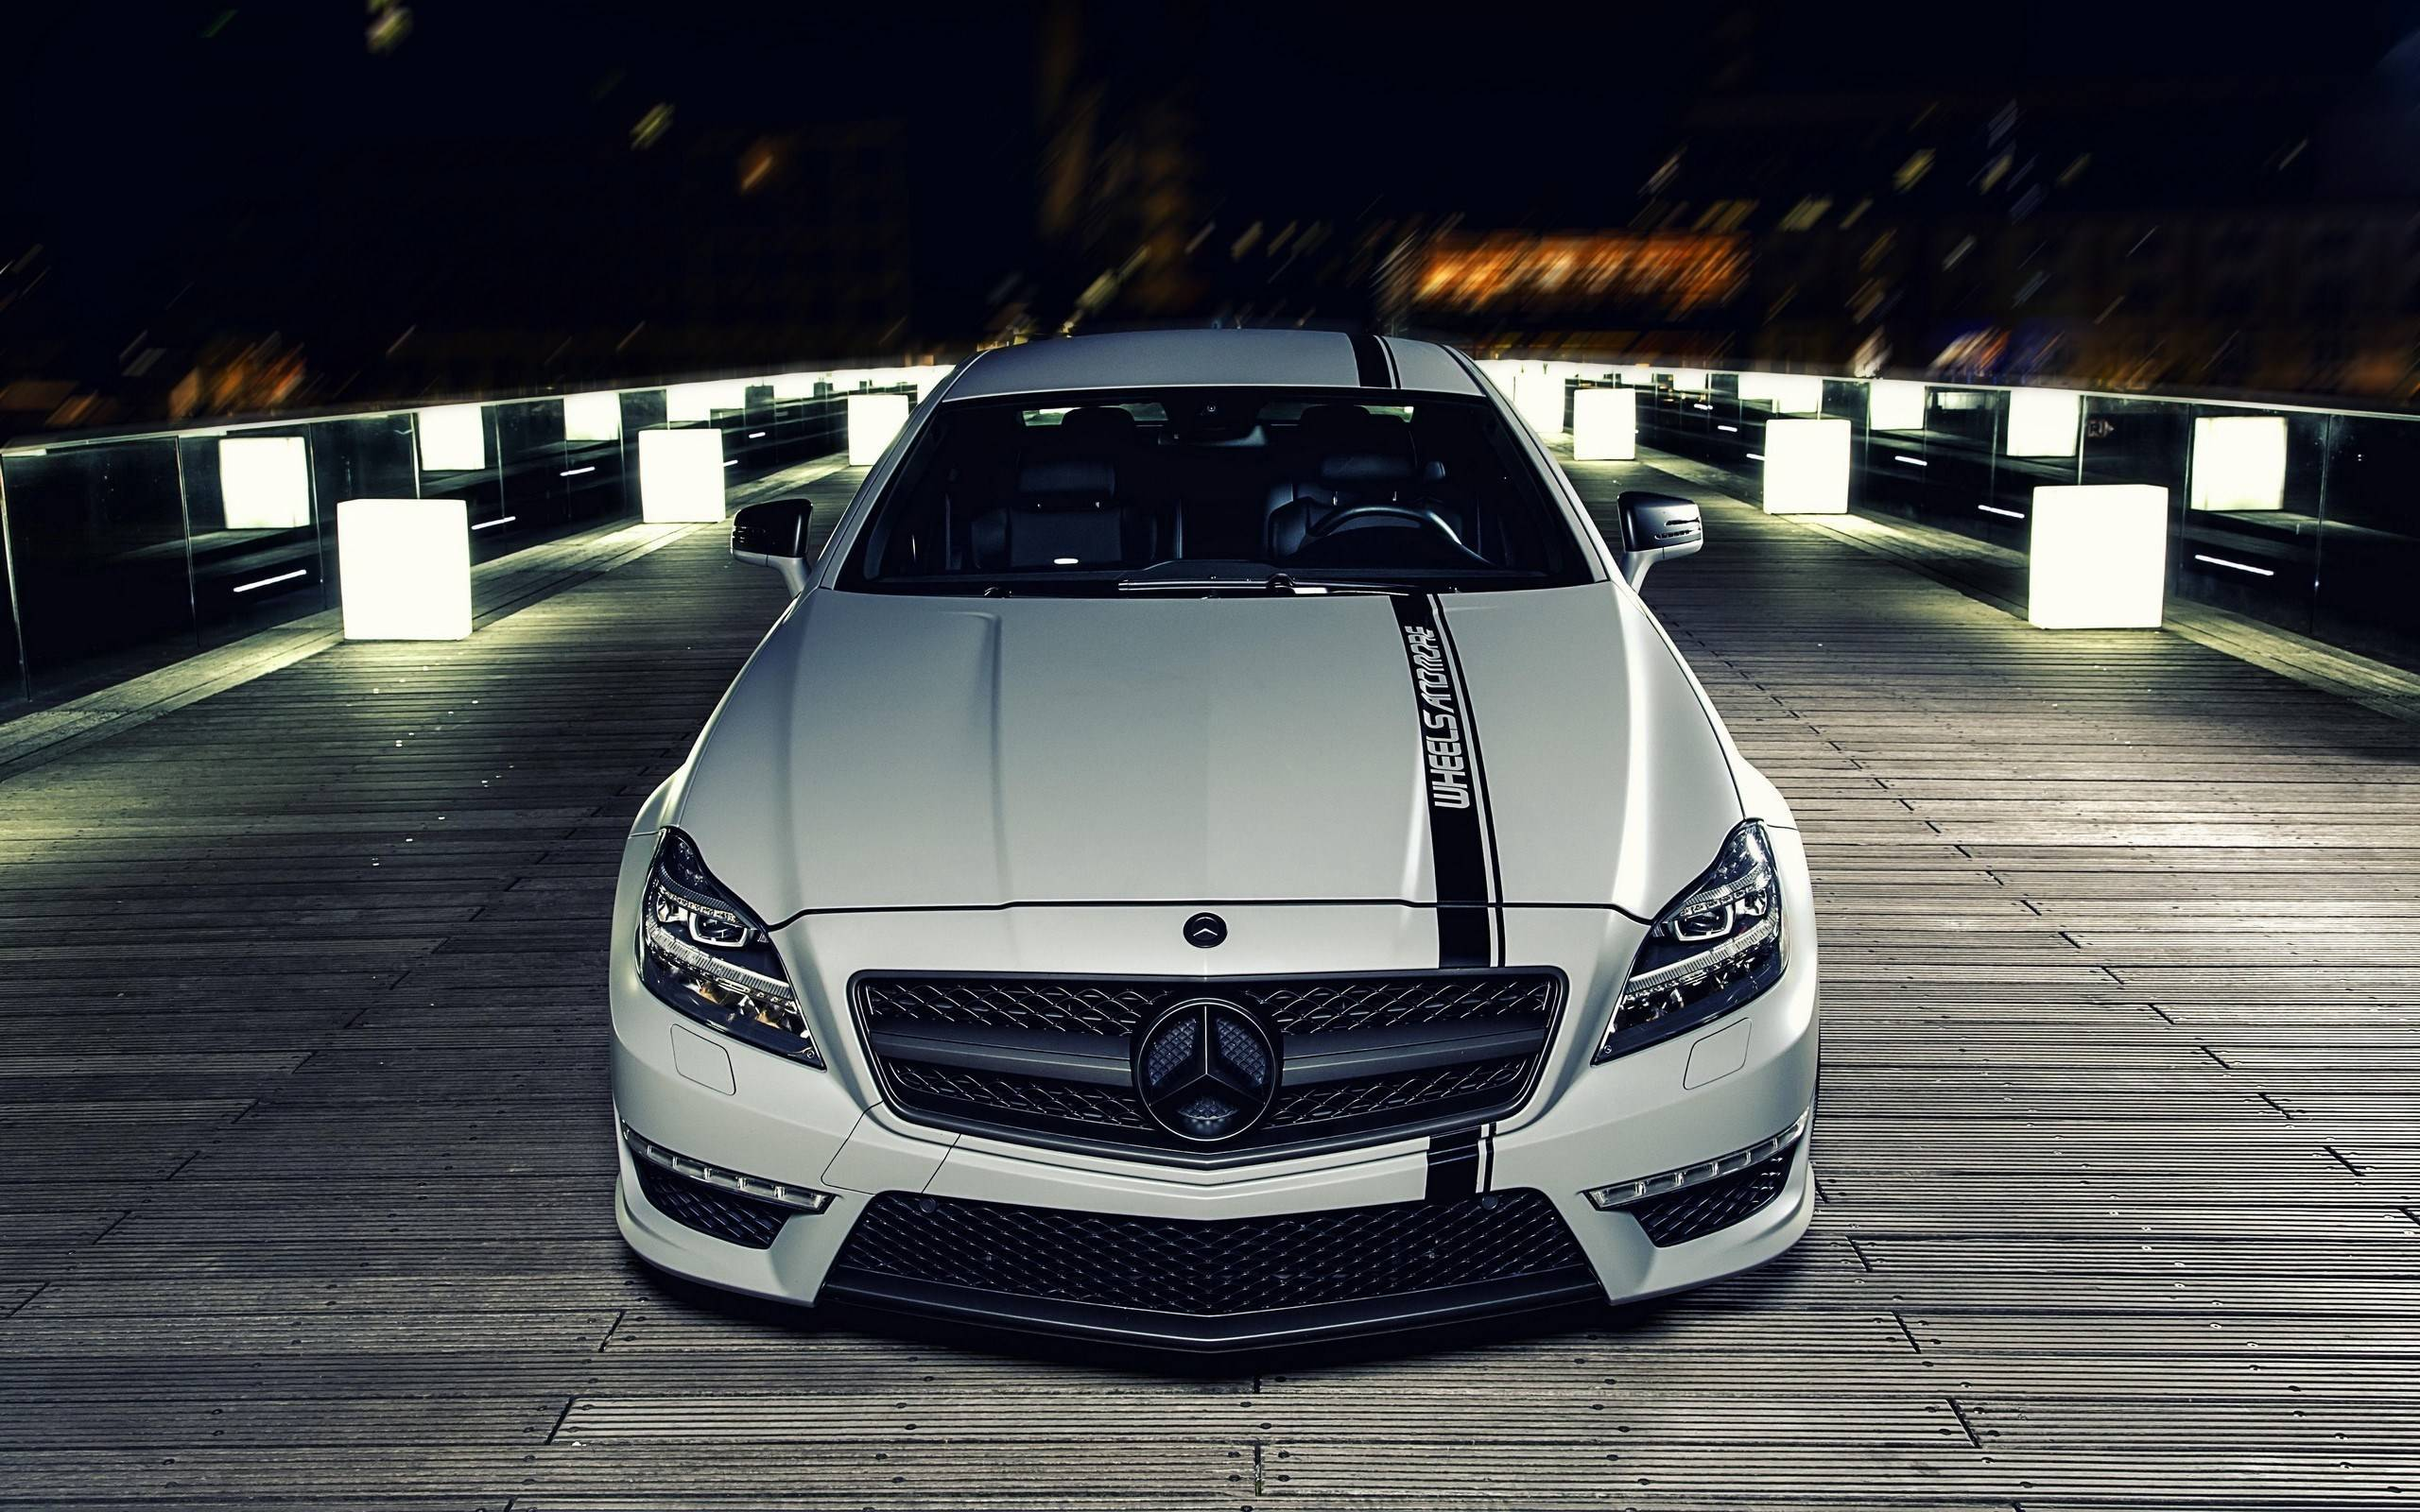 Mercedes Benz AMG Wallpapers 2560x1600